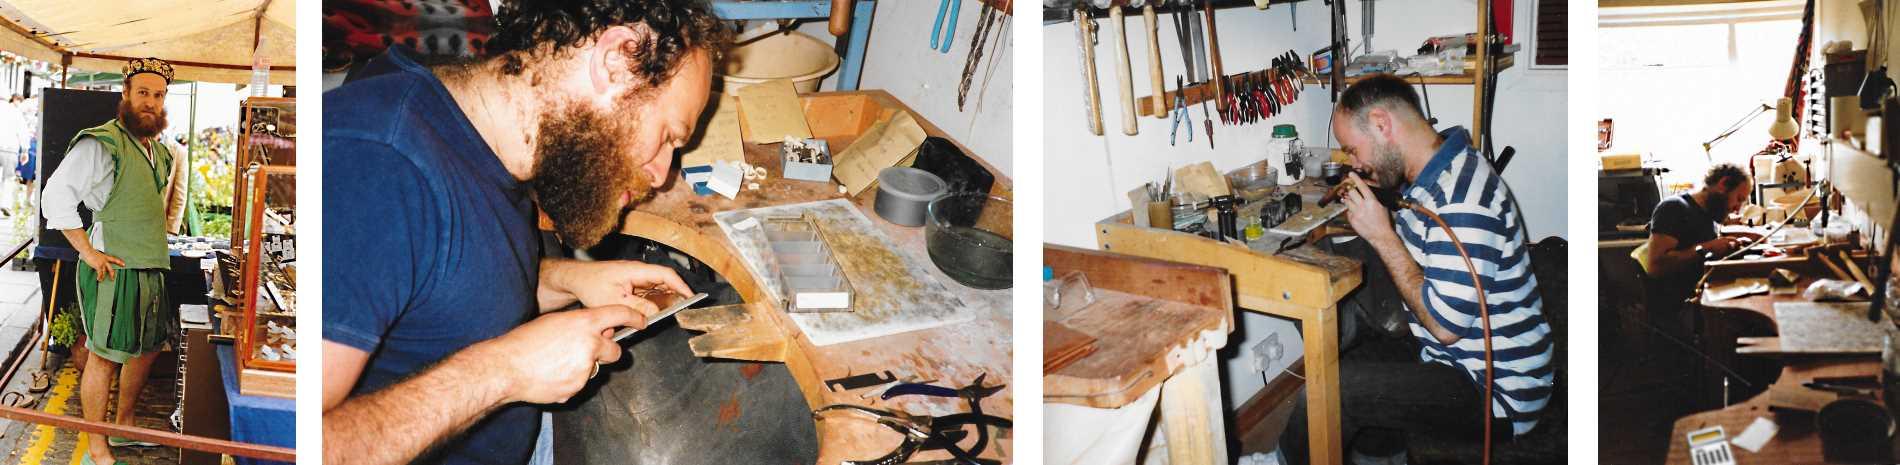 Simon Gorgin Making Bespoke Jewellery